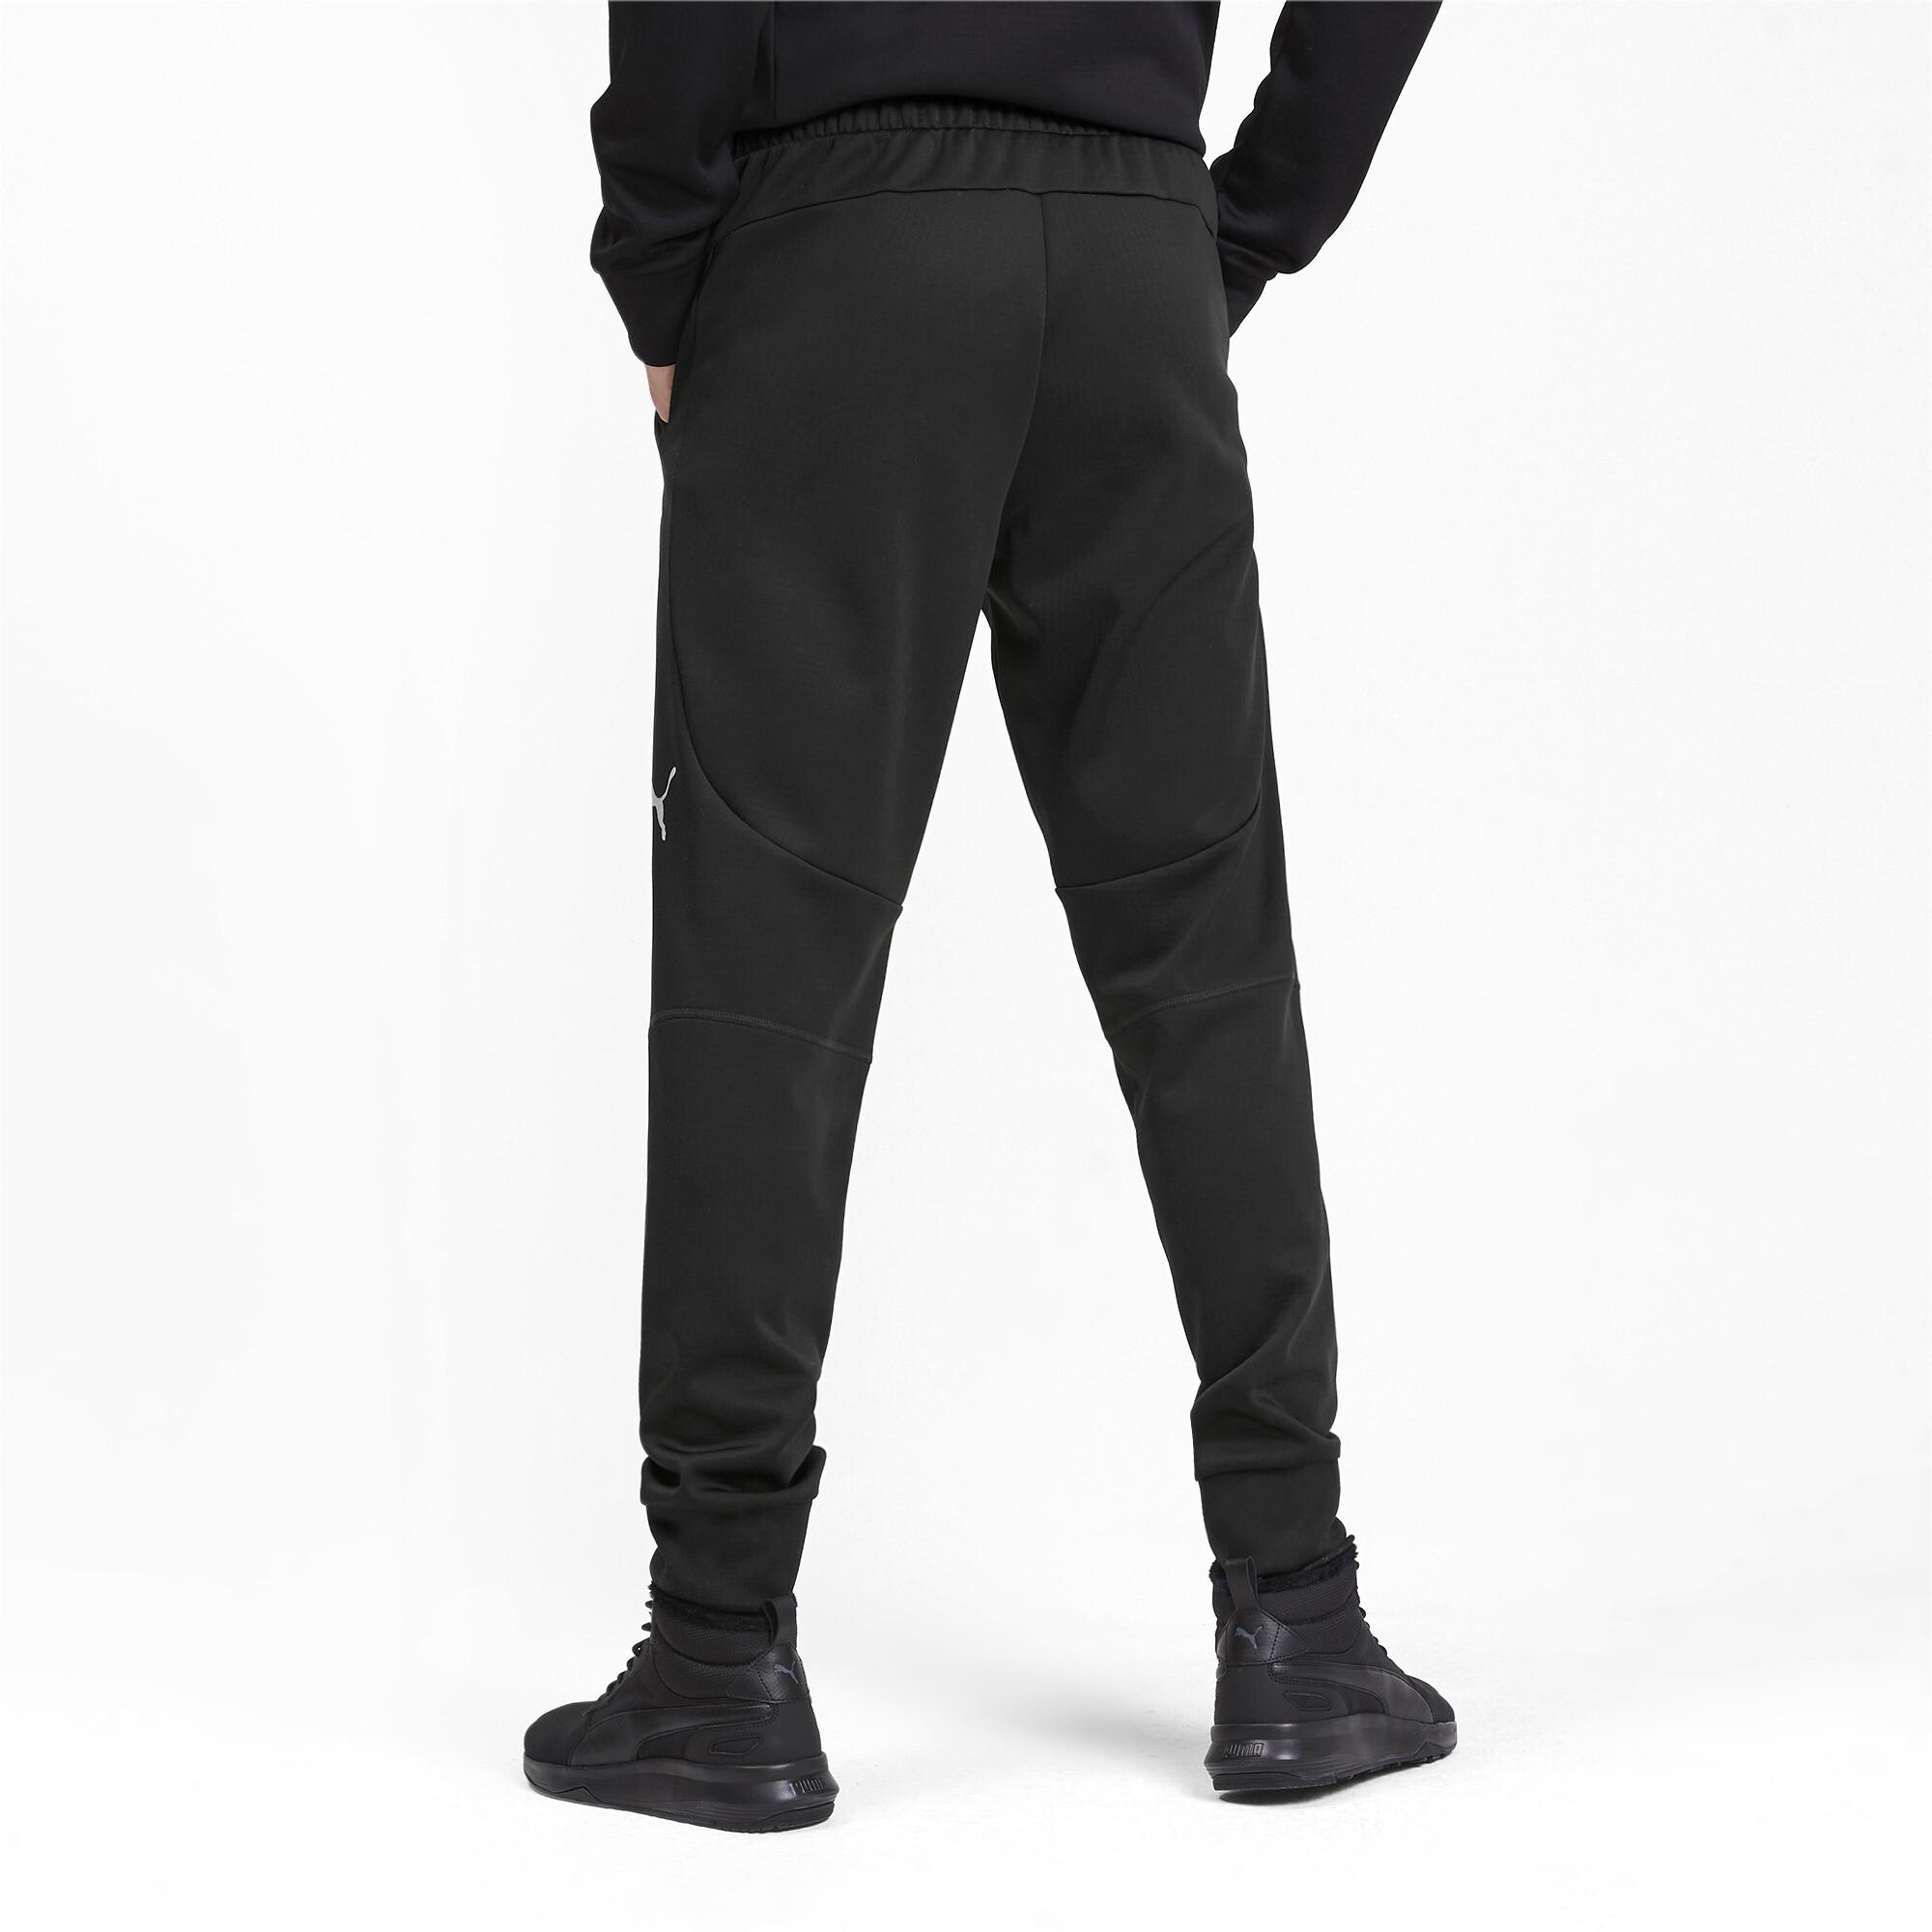 PUMA-Evostripe-Warm-Men-039-s-Pants-Men-Knitted-Pants-Basics miniatura 10